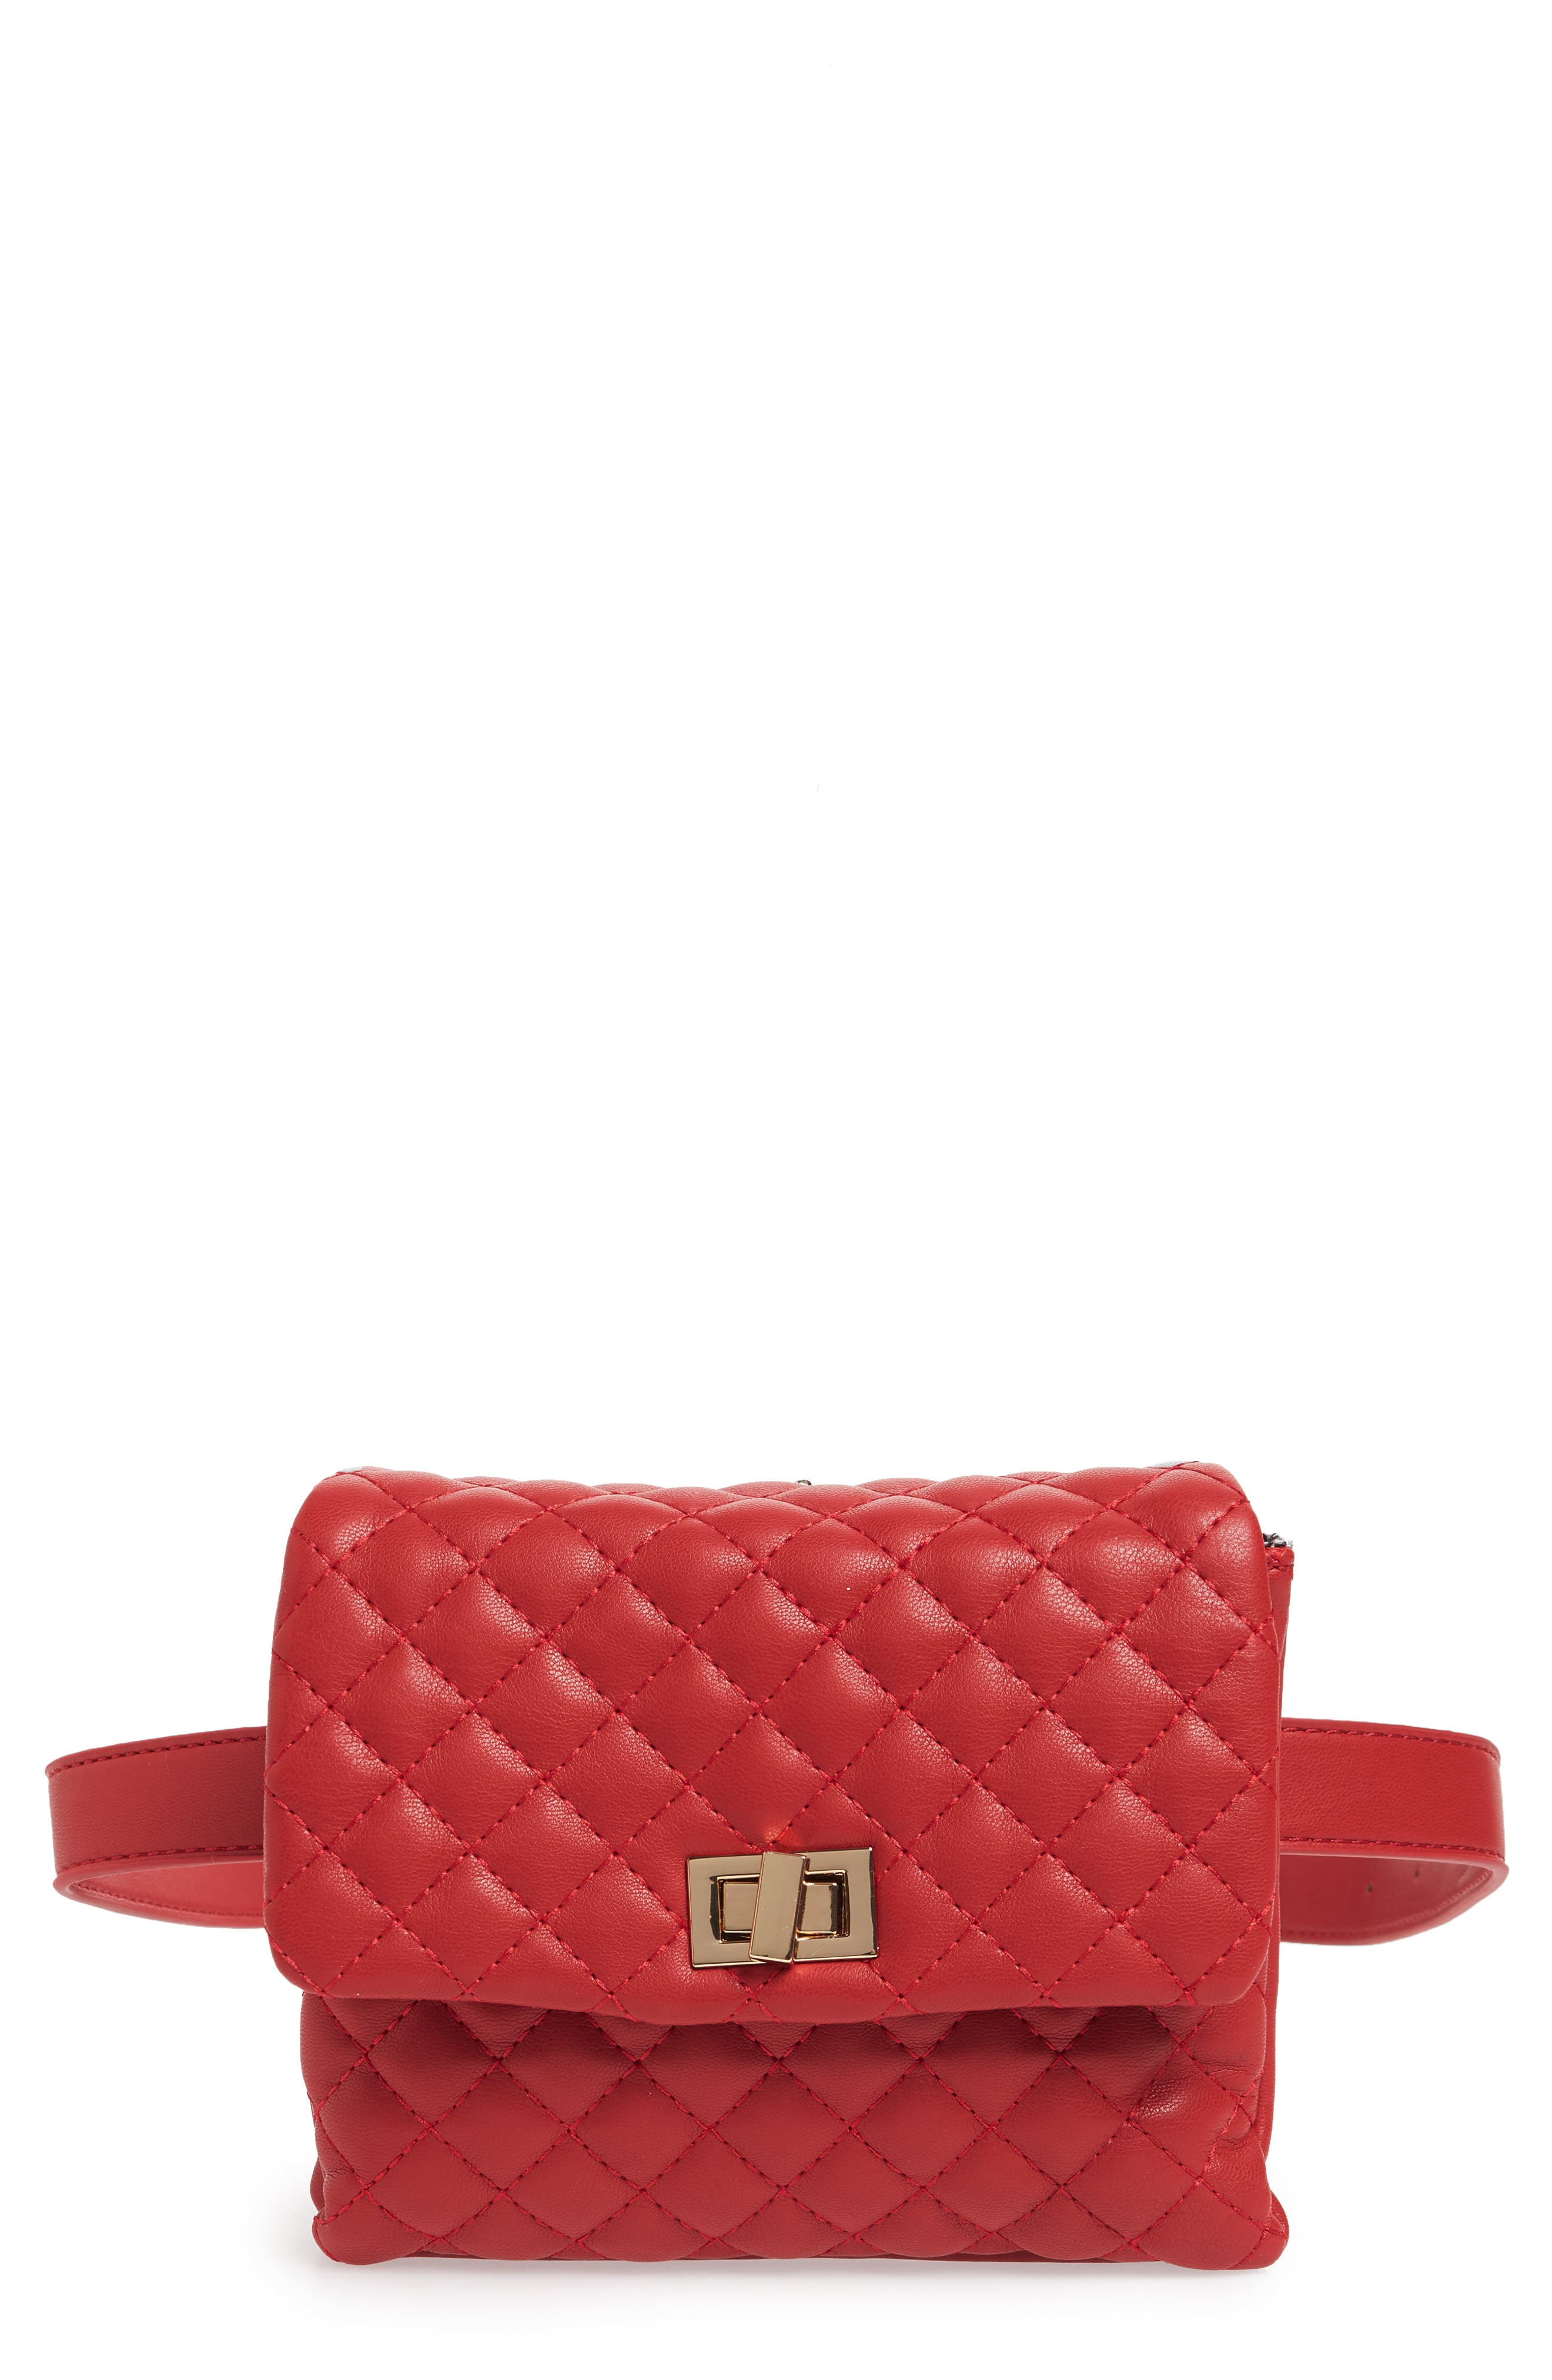 Buy mali + lili bags for women - Best women s mali + lili bags shop ... fd9f531cda98e